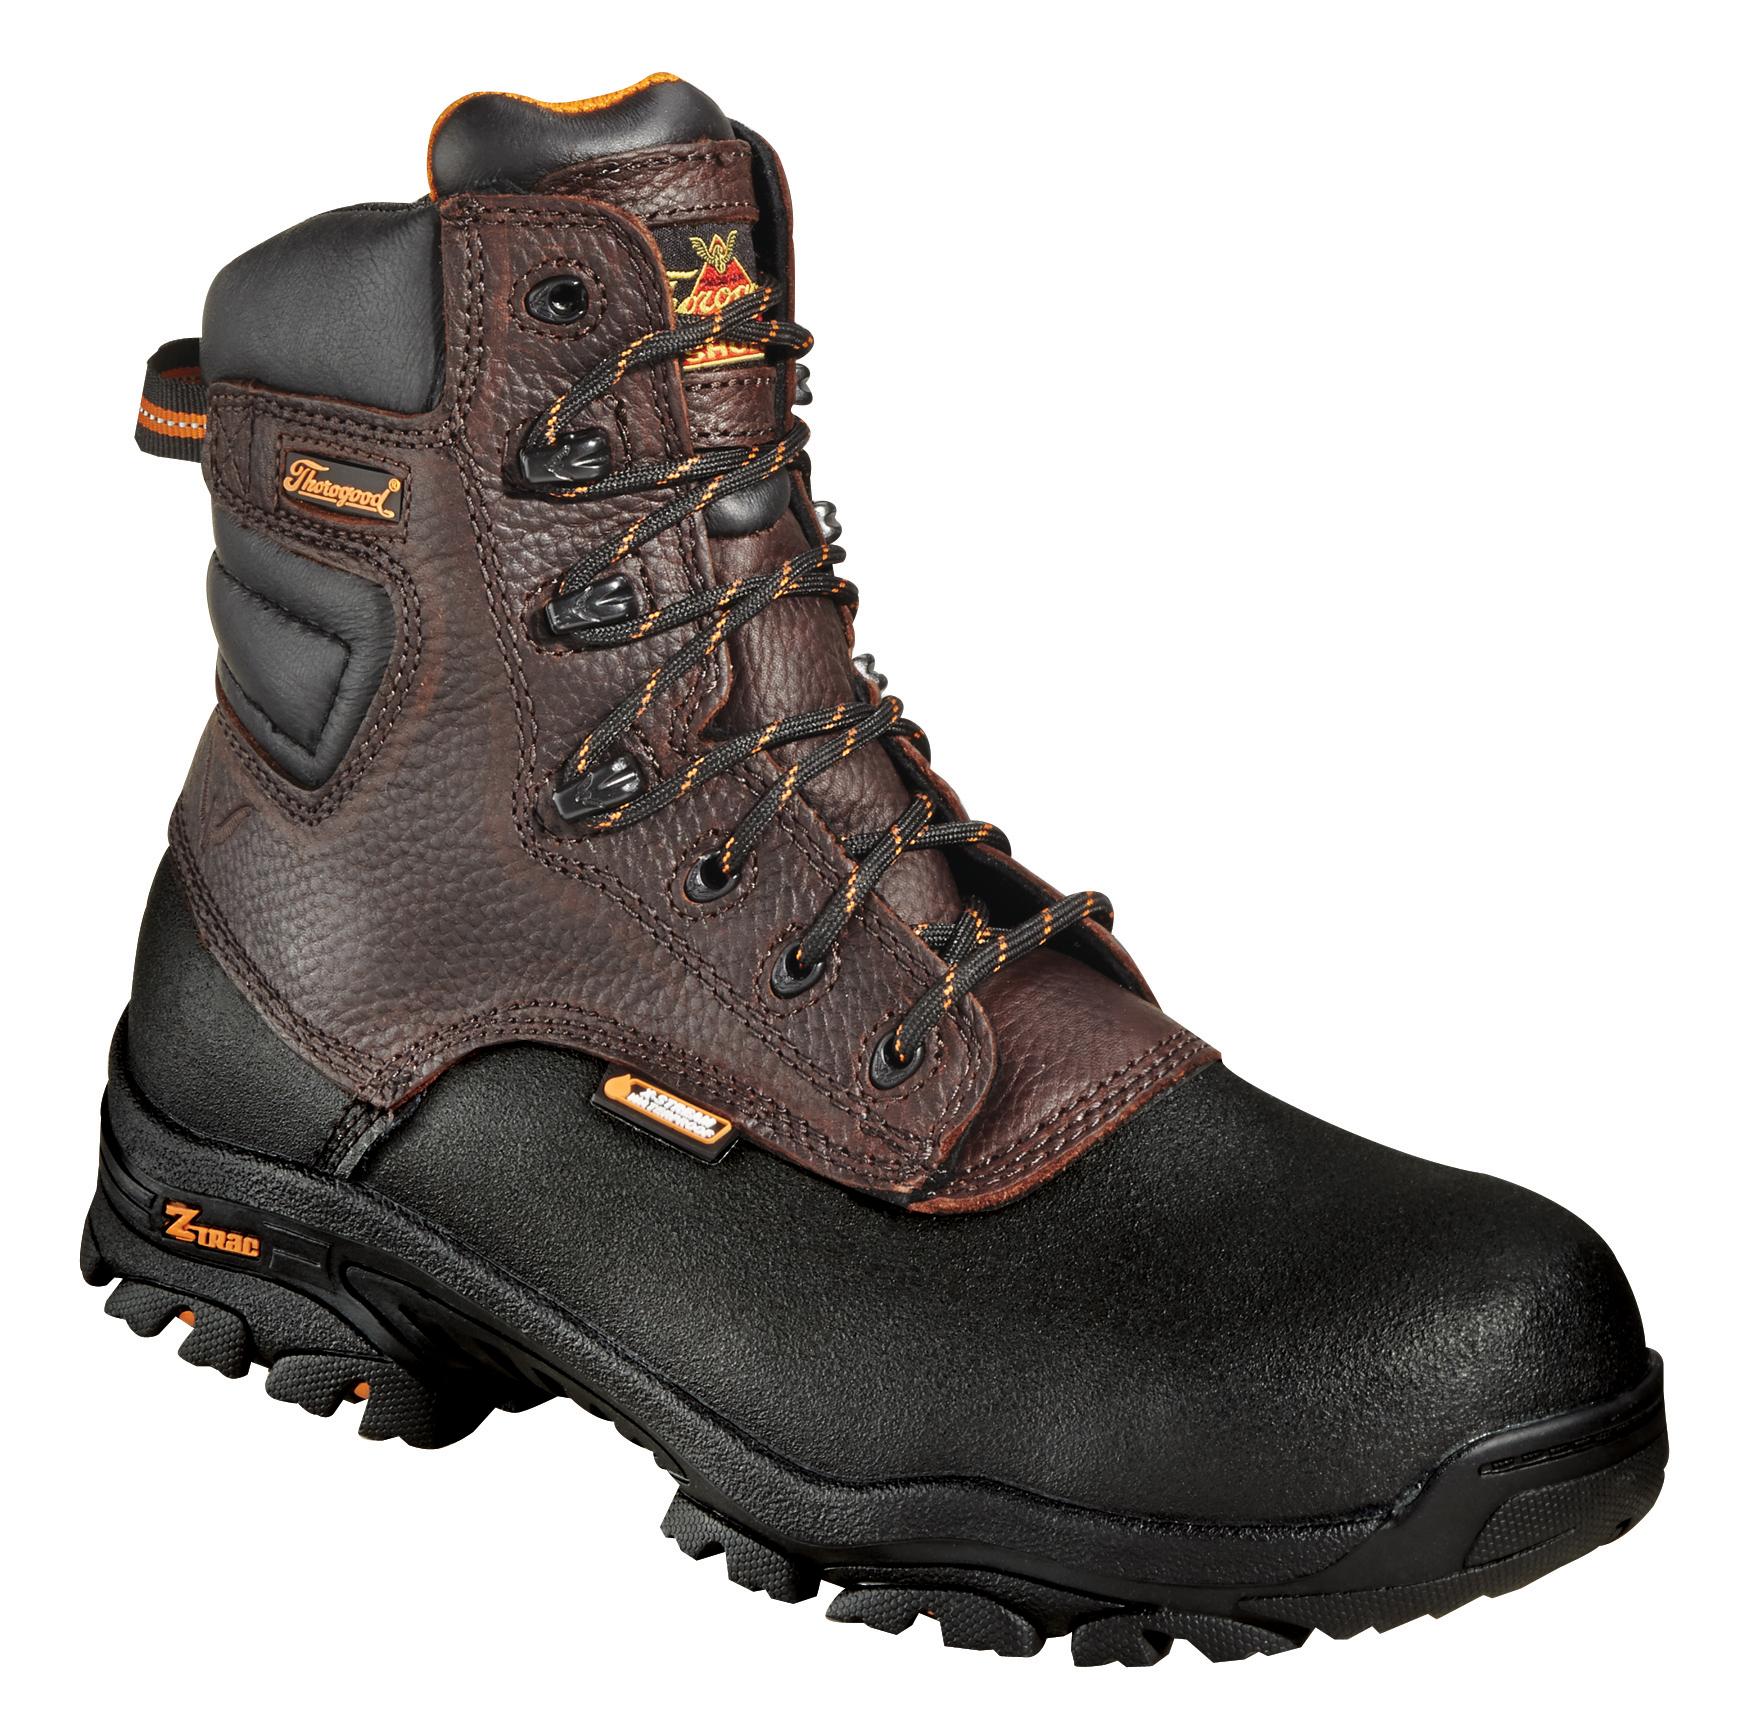 Thorogood Waterproof Lightweight Work Boots 804 4808